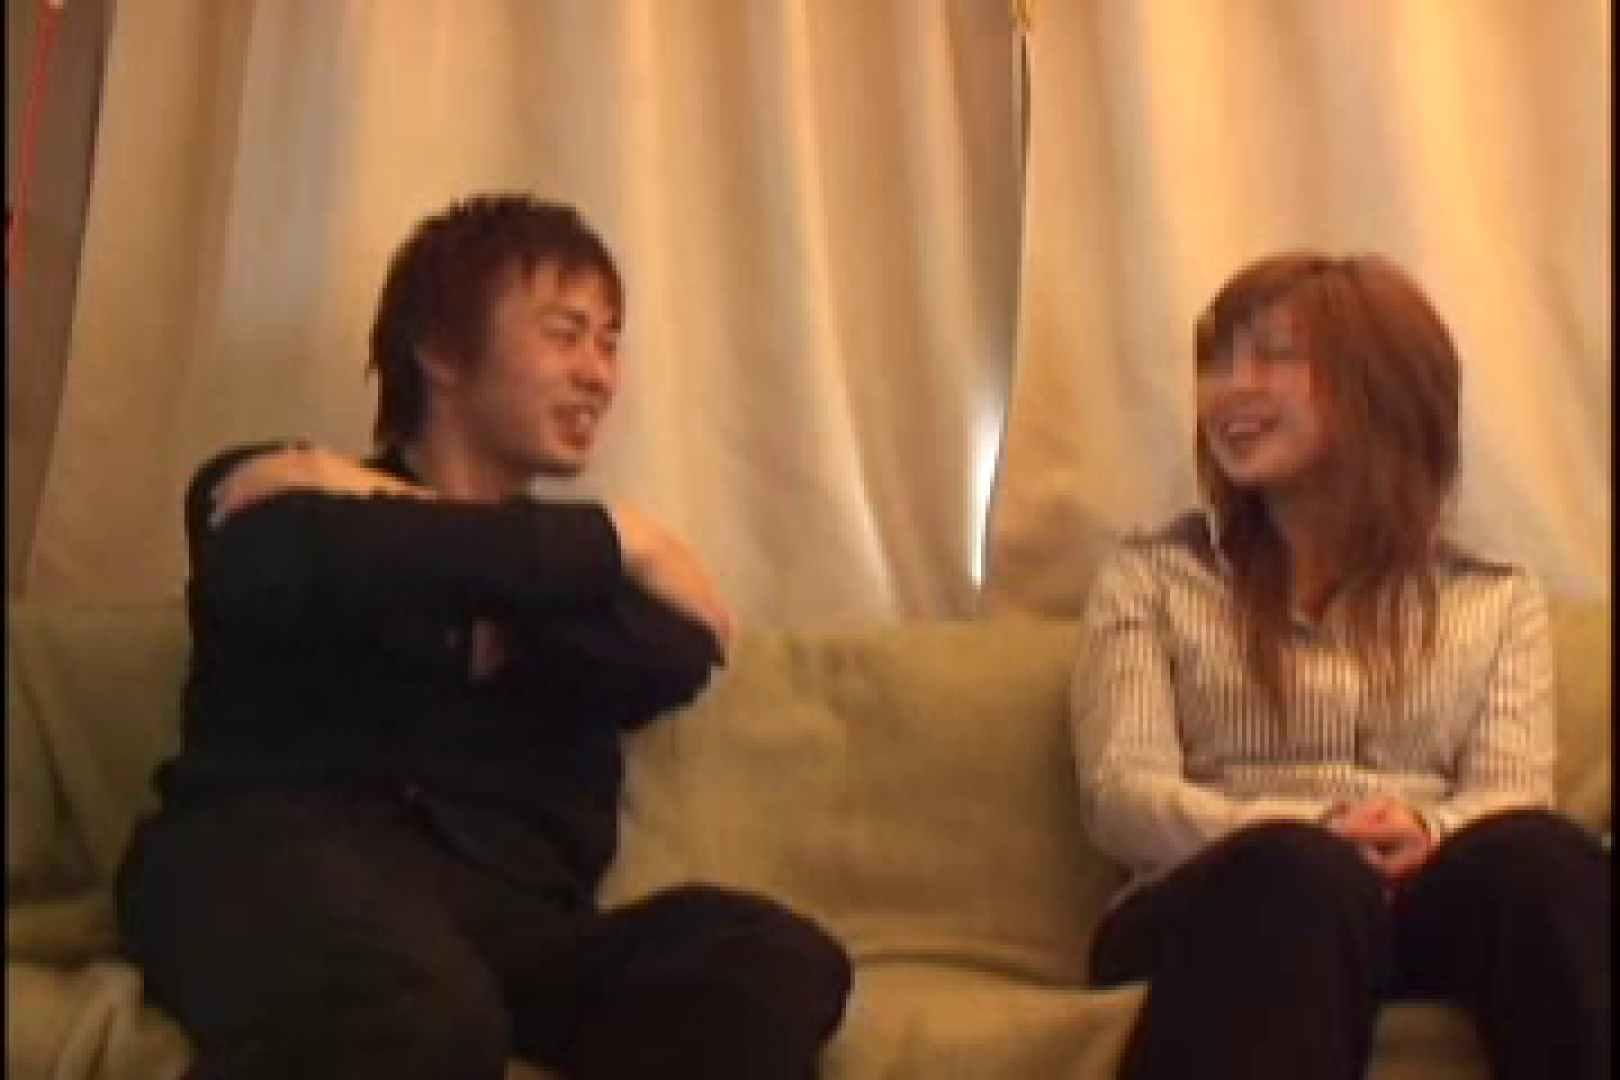 BEST OF イケメン!!男目線のガチSEX vol.03(対女性作品) 男祭り ゲイ無修正動画画像 56枚 2